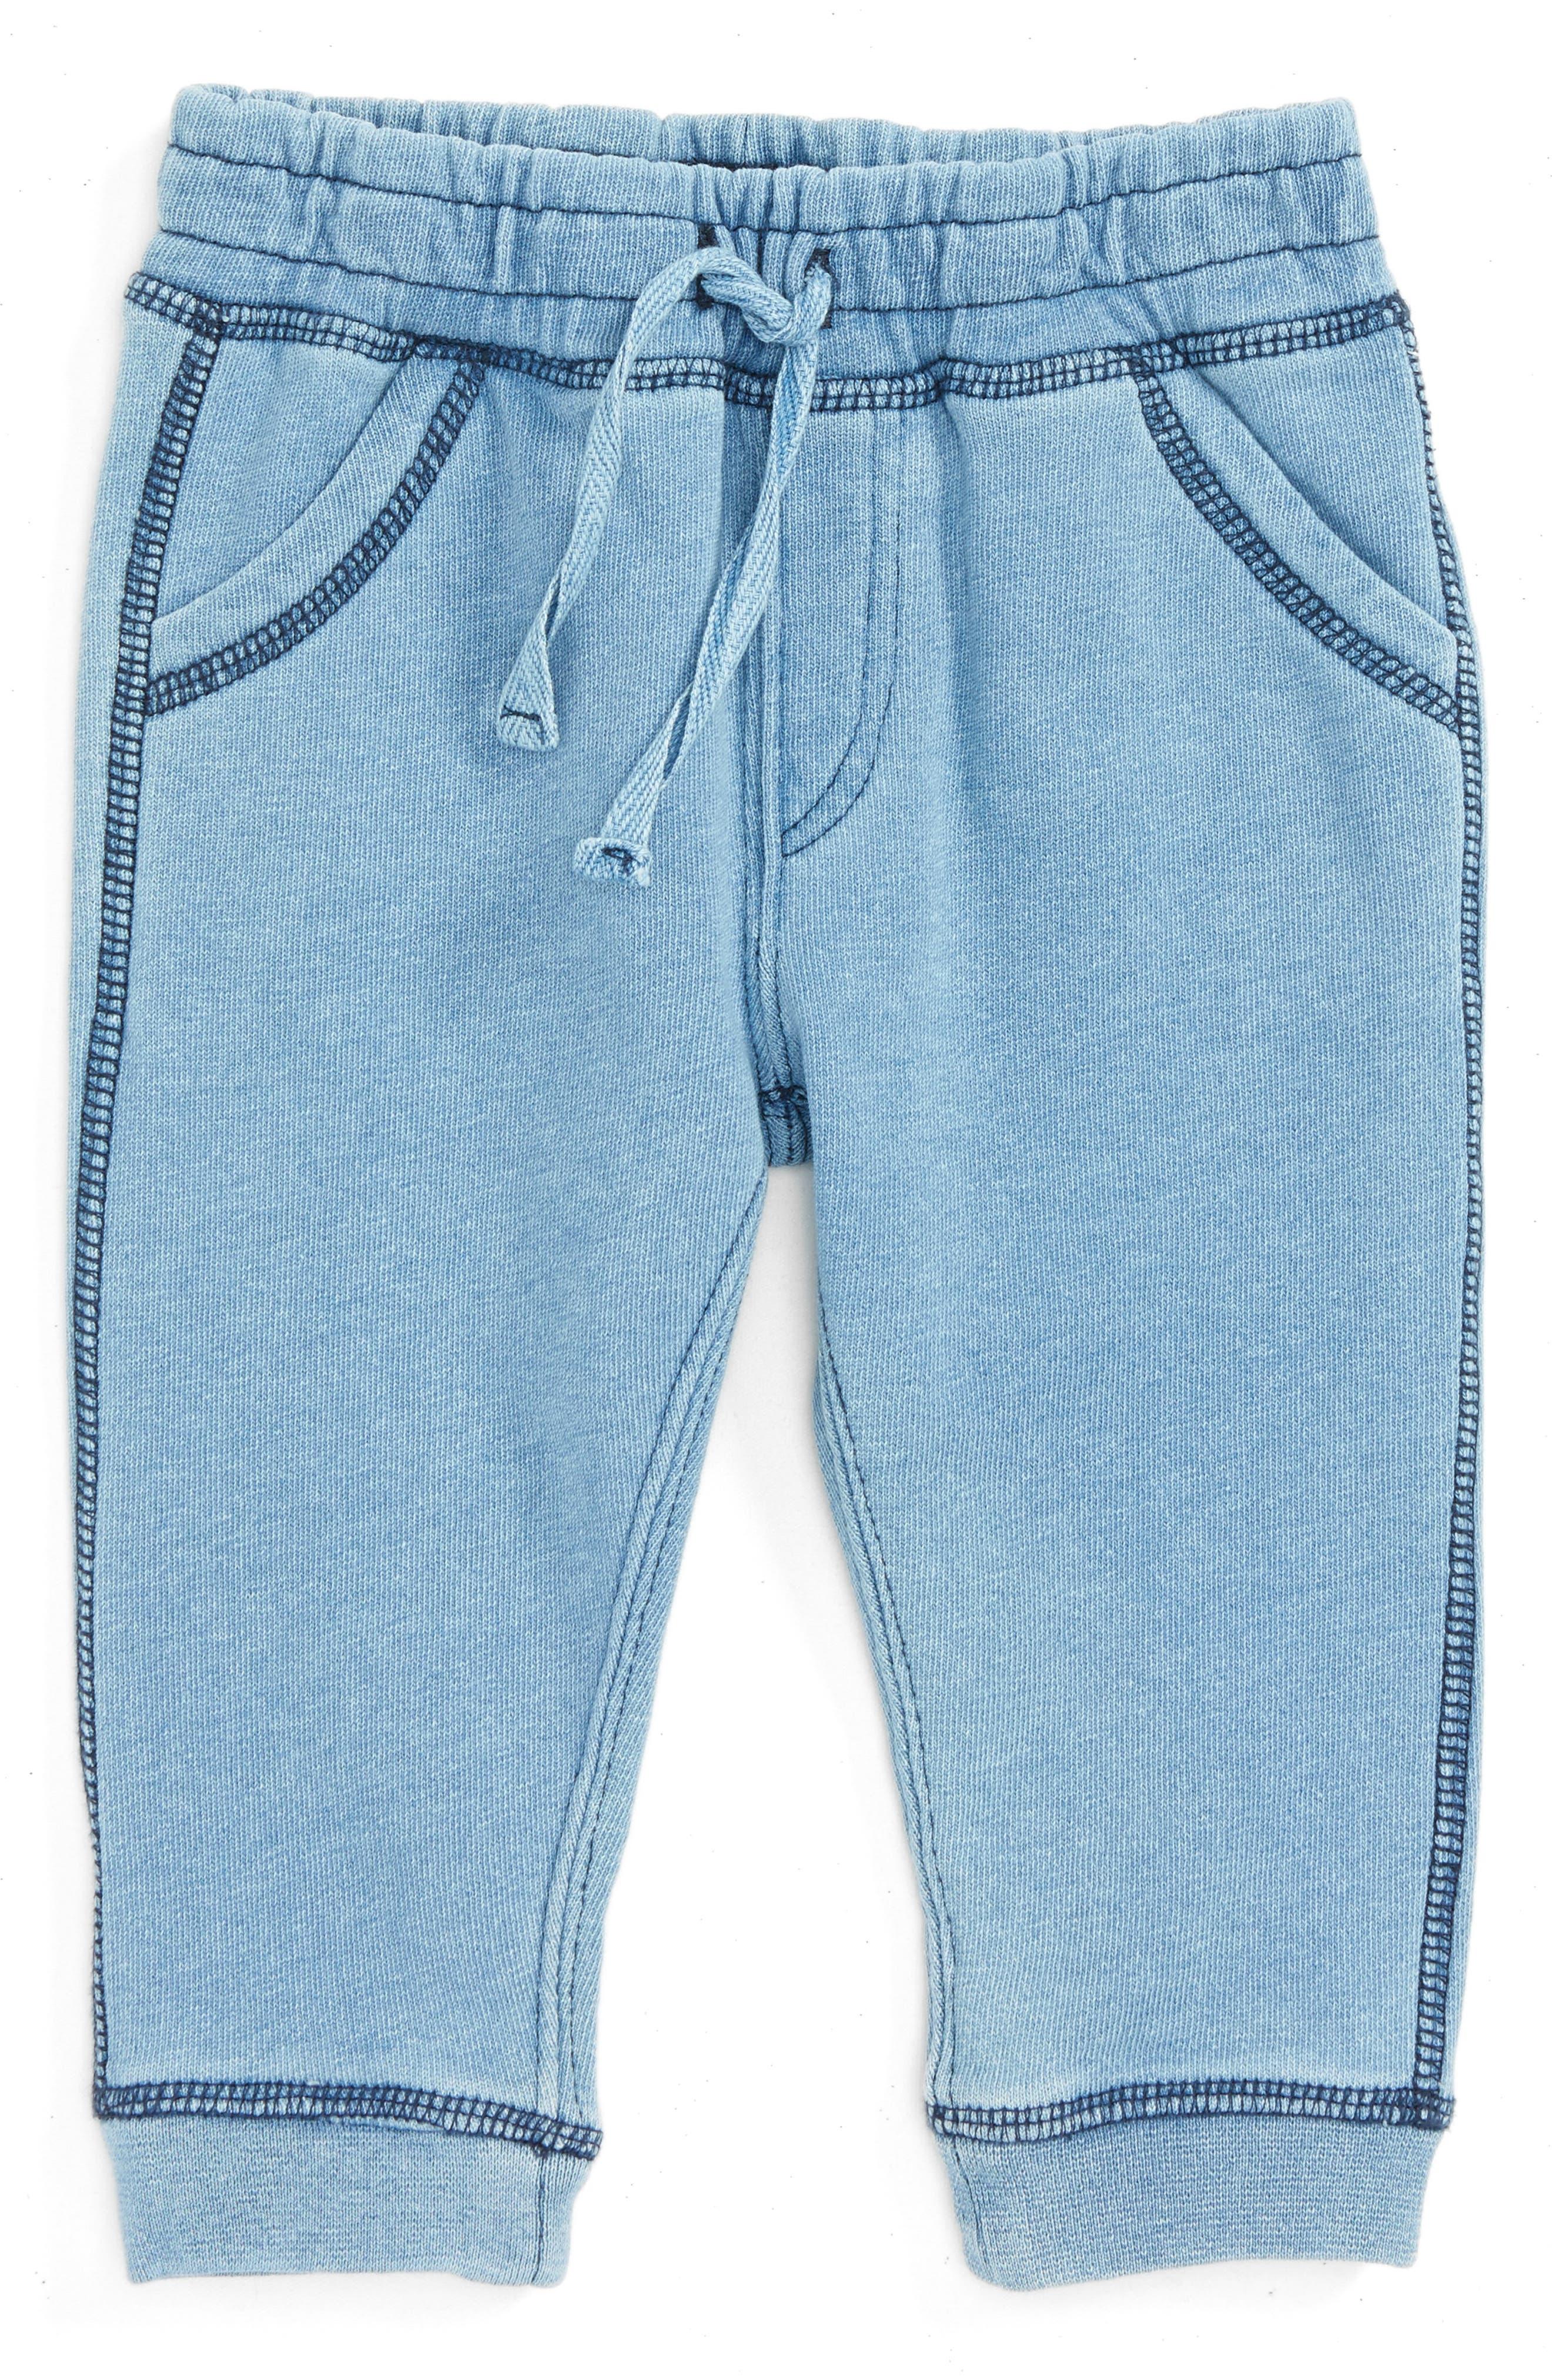 Main Image - Tucker + Tate Knit Denim Pants (Baby)